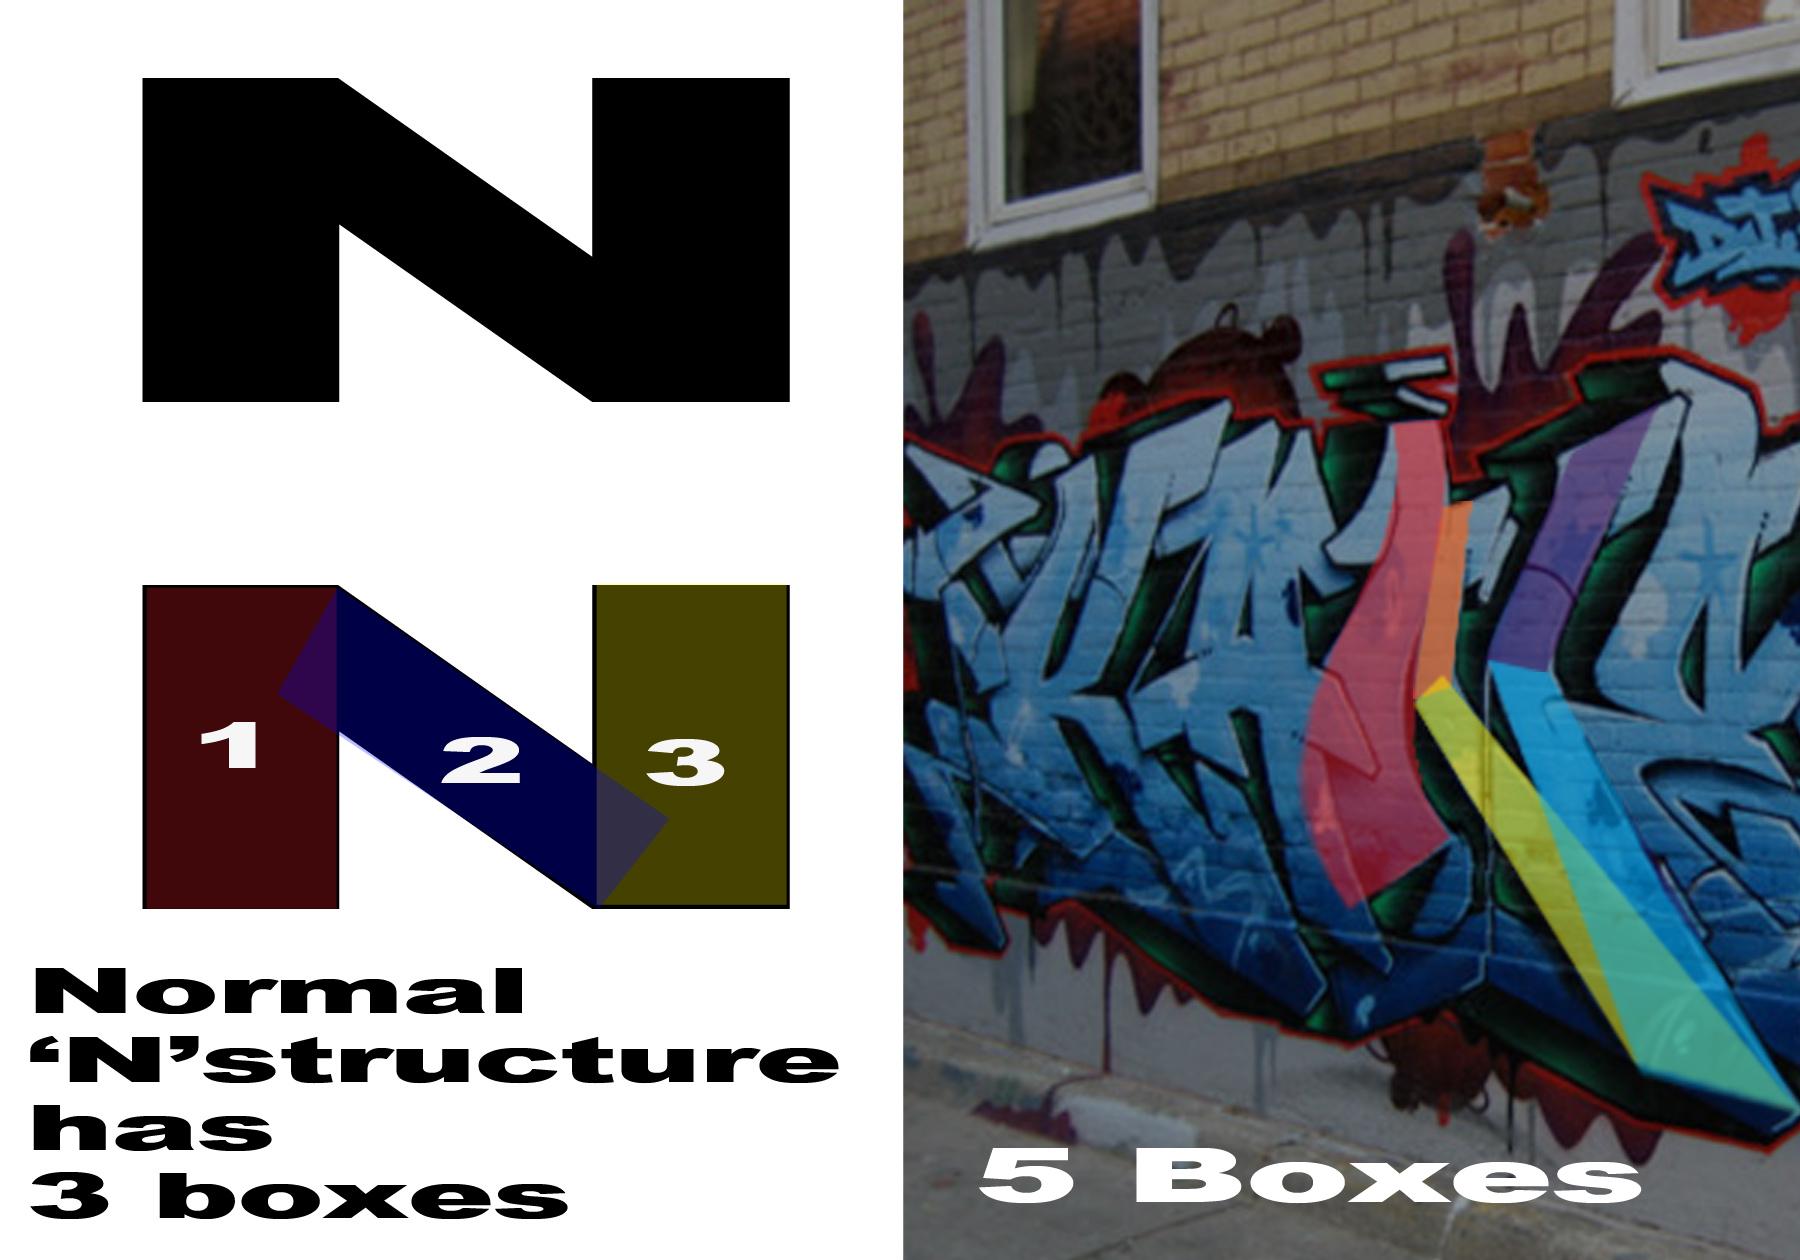 boxes vs style.jpg